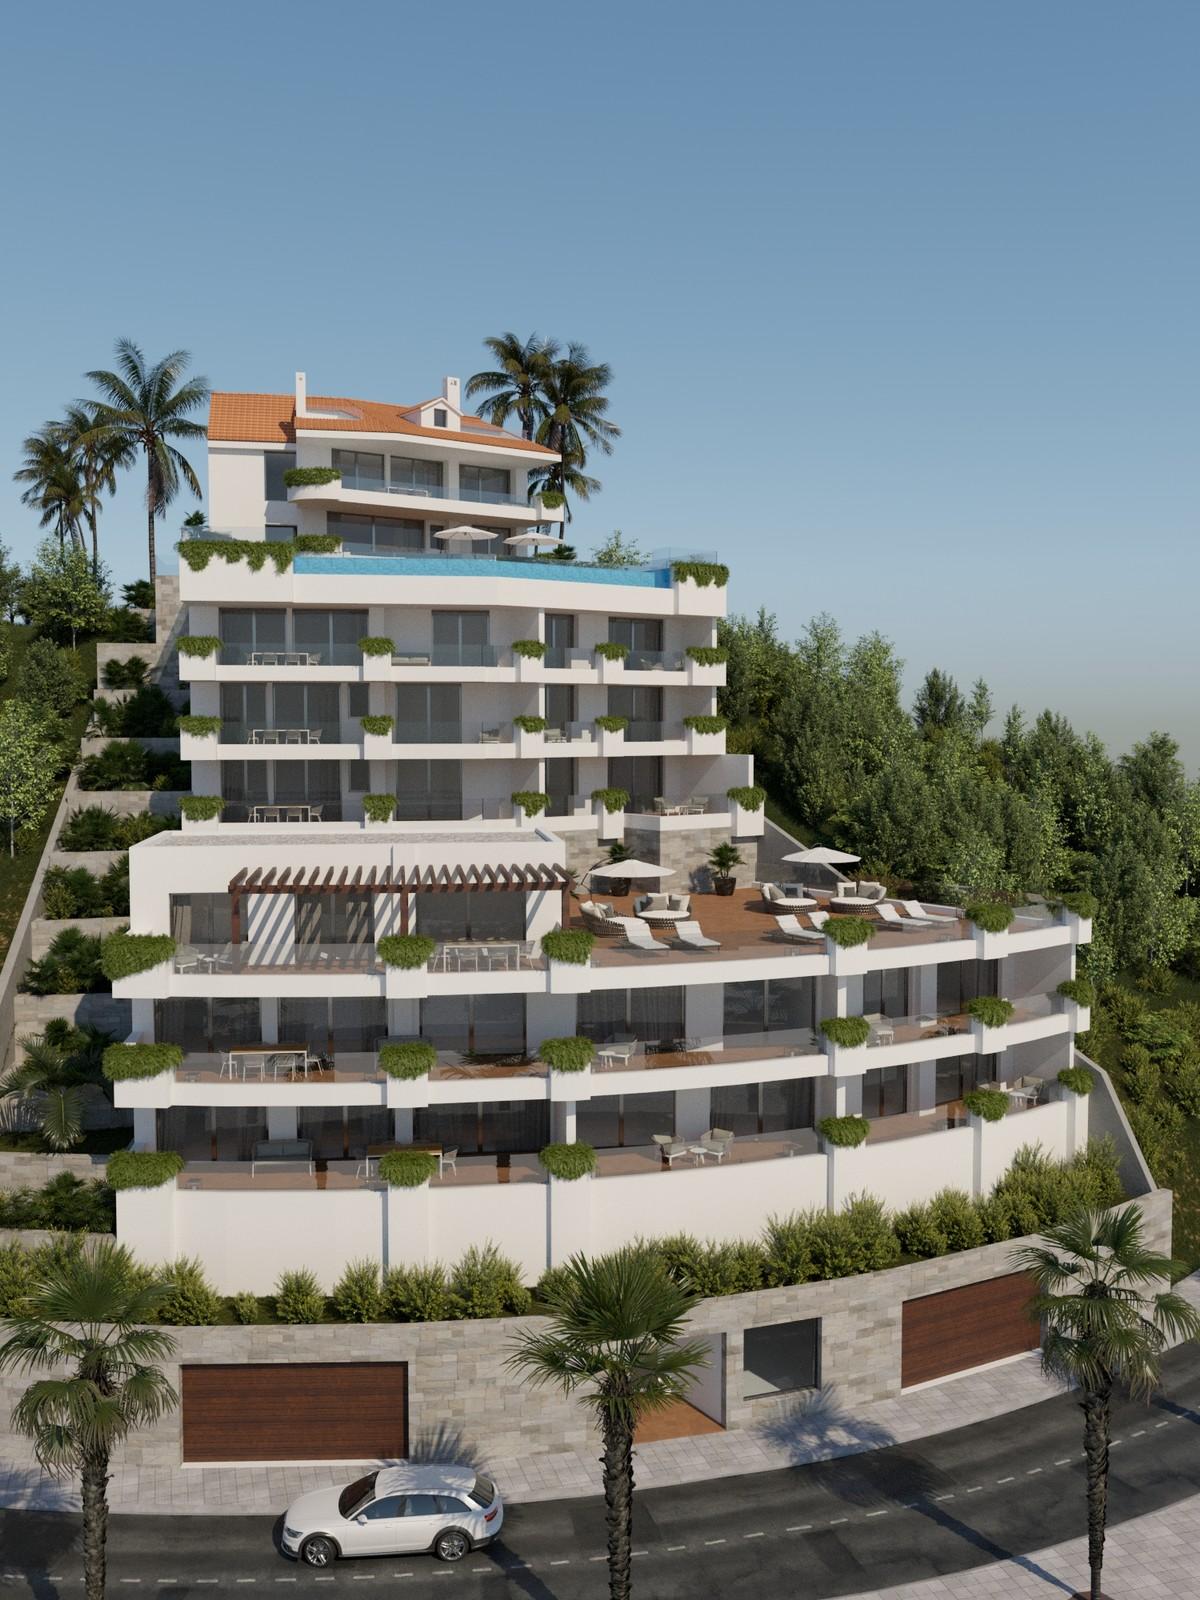 New development Apartment in Benalmadena